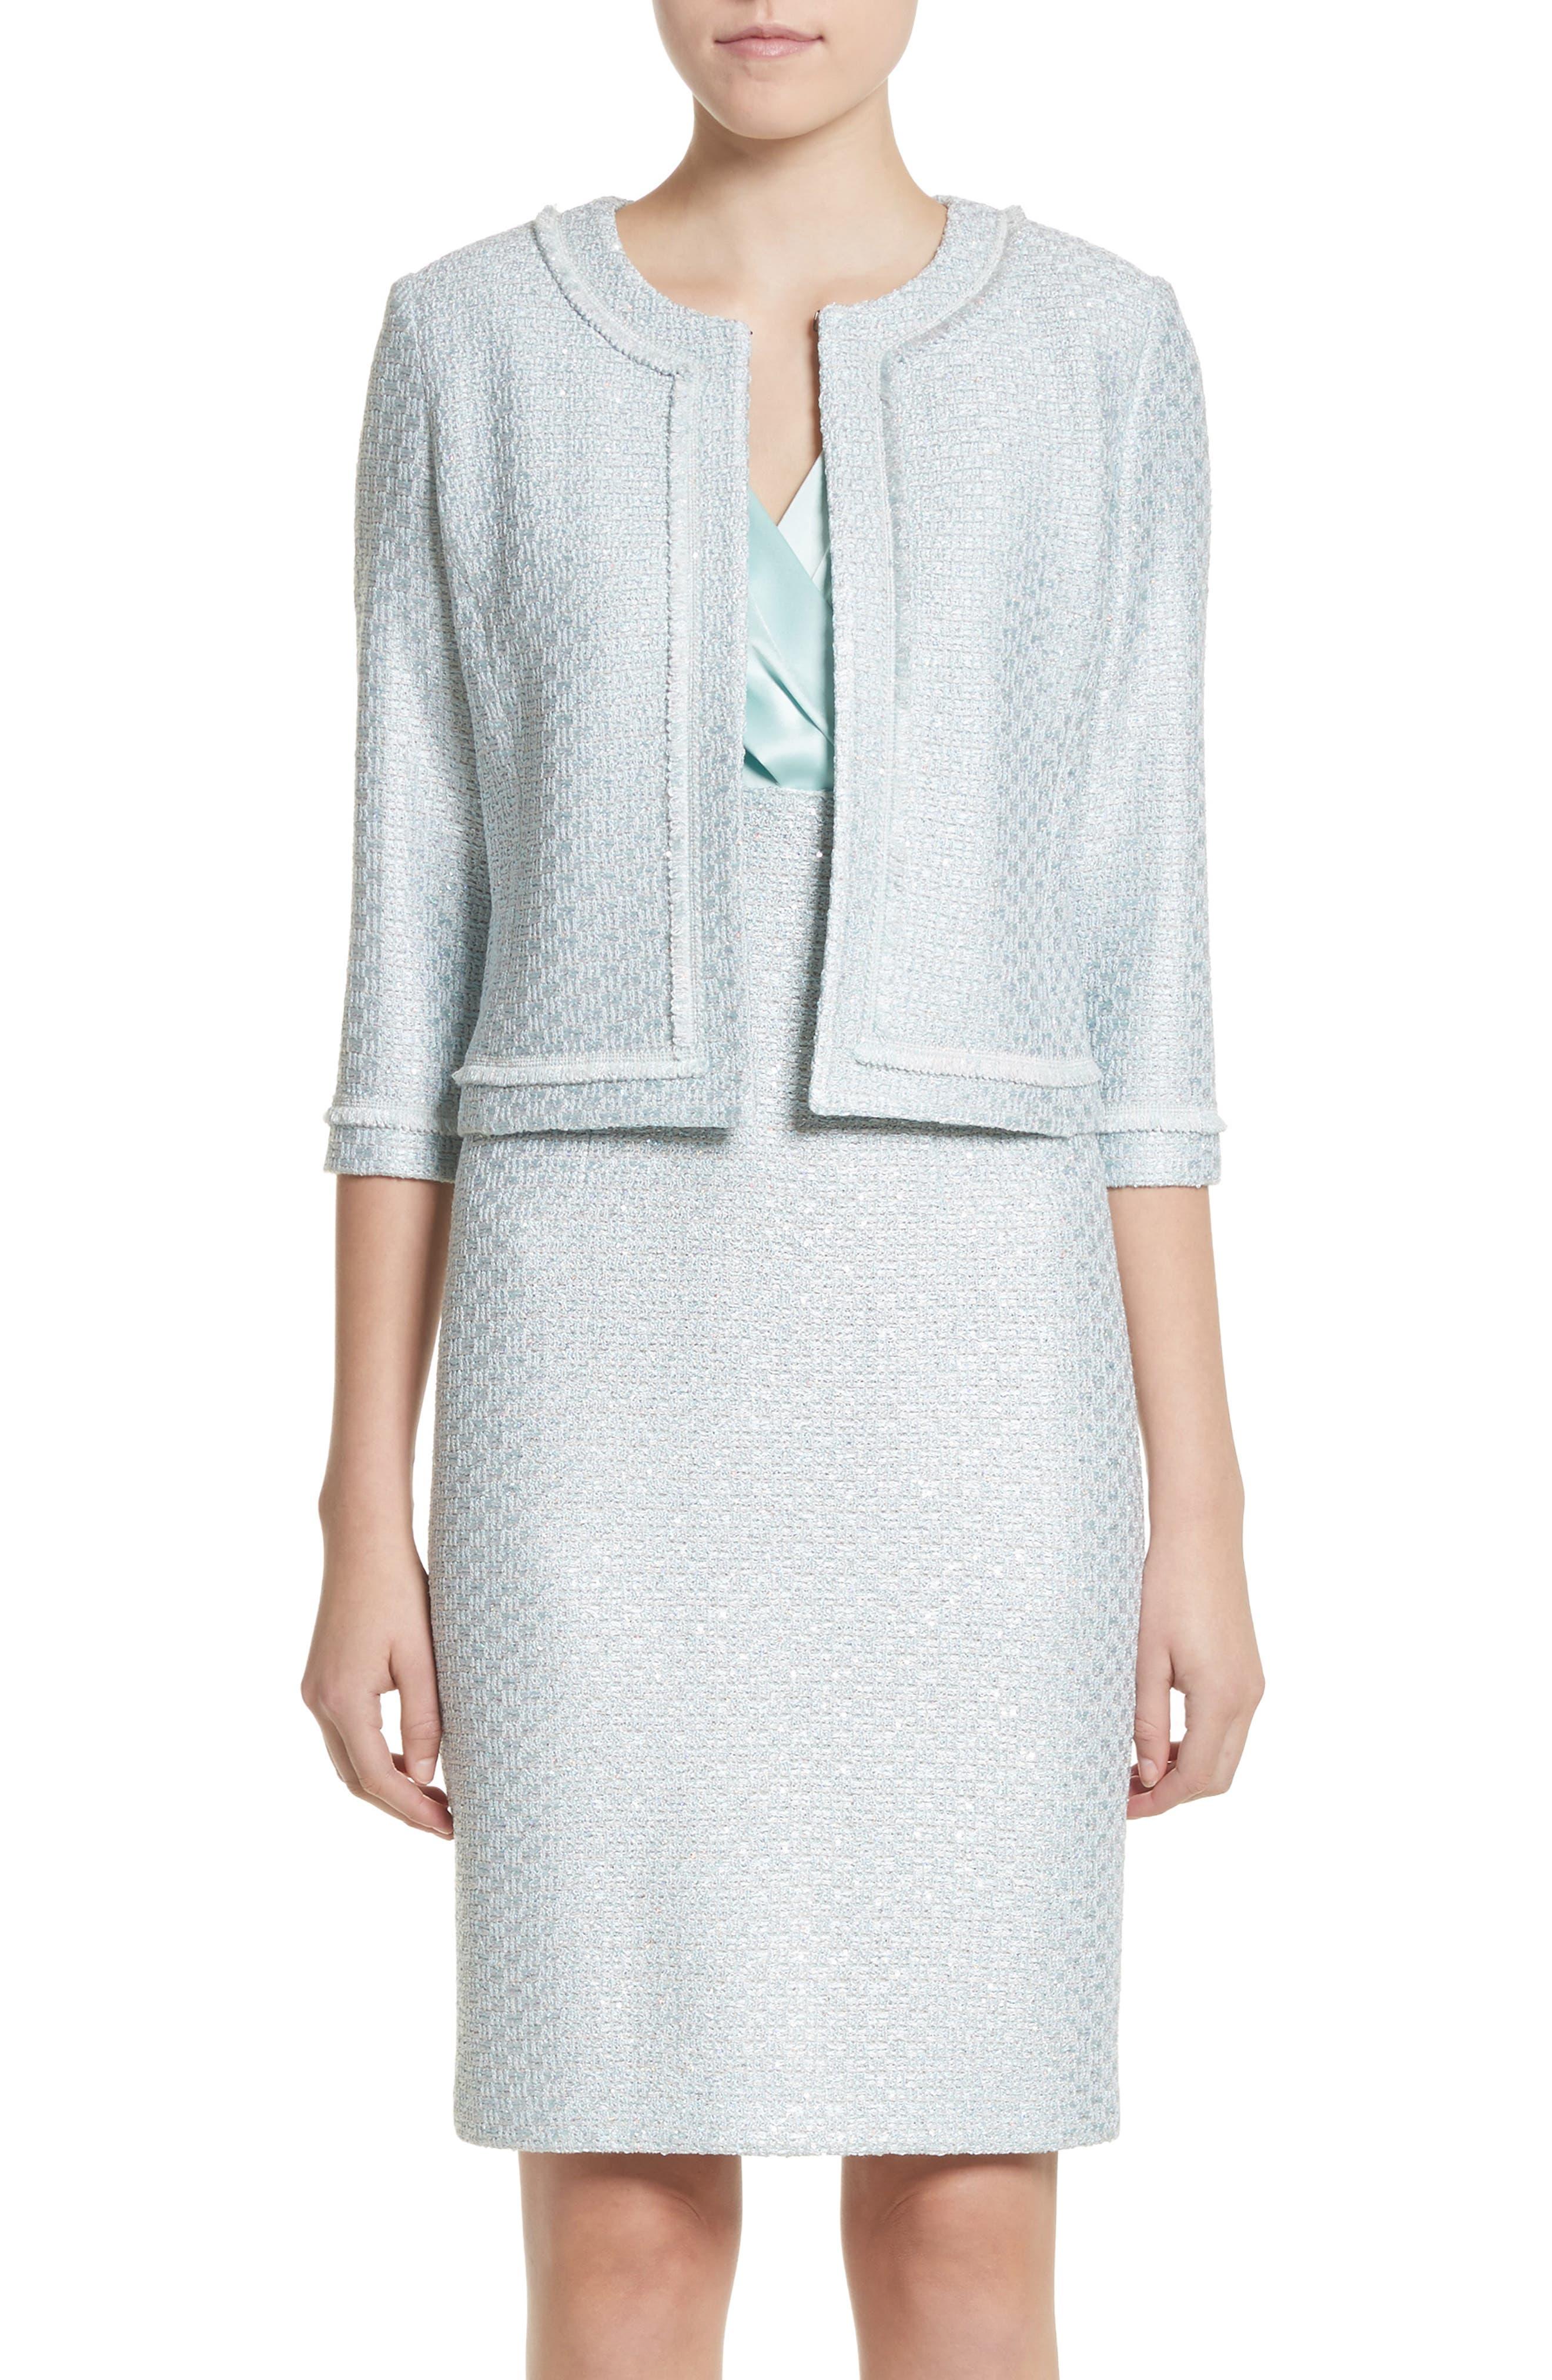 Hansh Sequin Knit Jacket,                             Main thumbnail 1, color,                             440